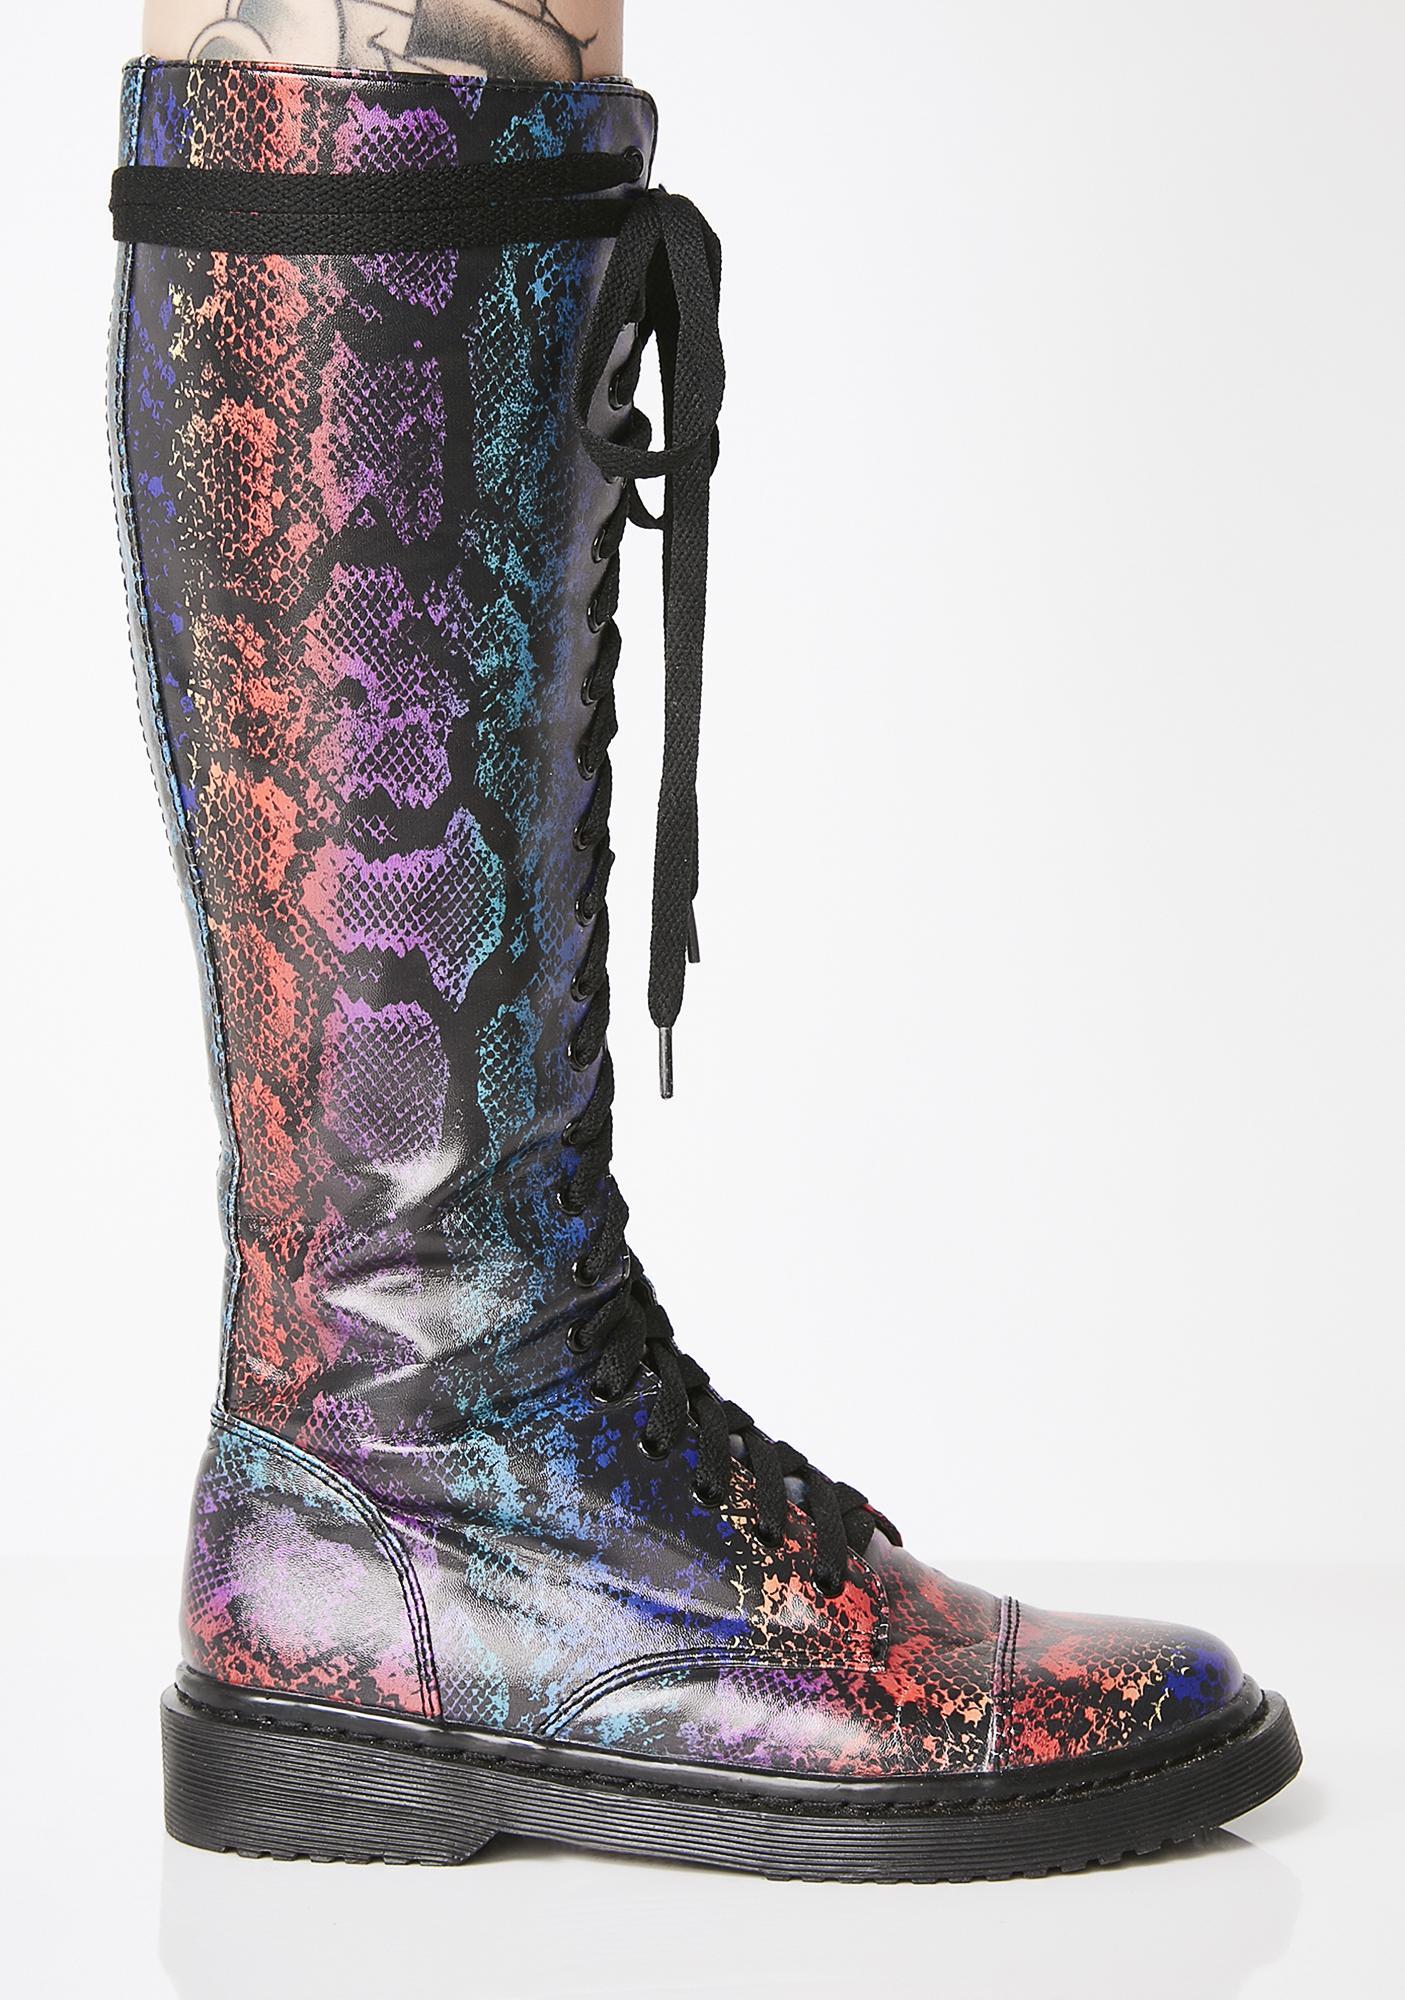 Club Exx Junglist Jewel Drop Combat Boots